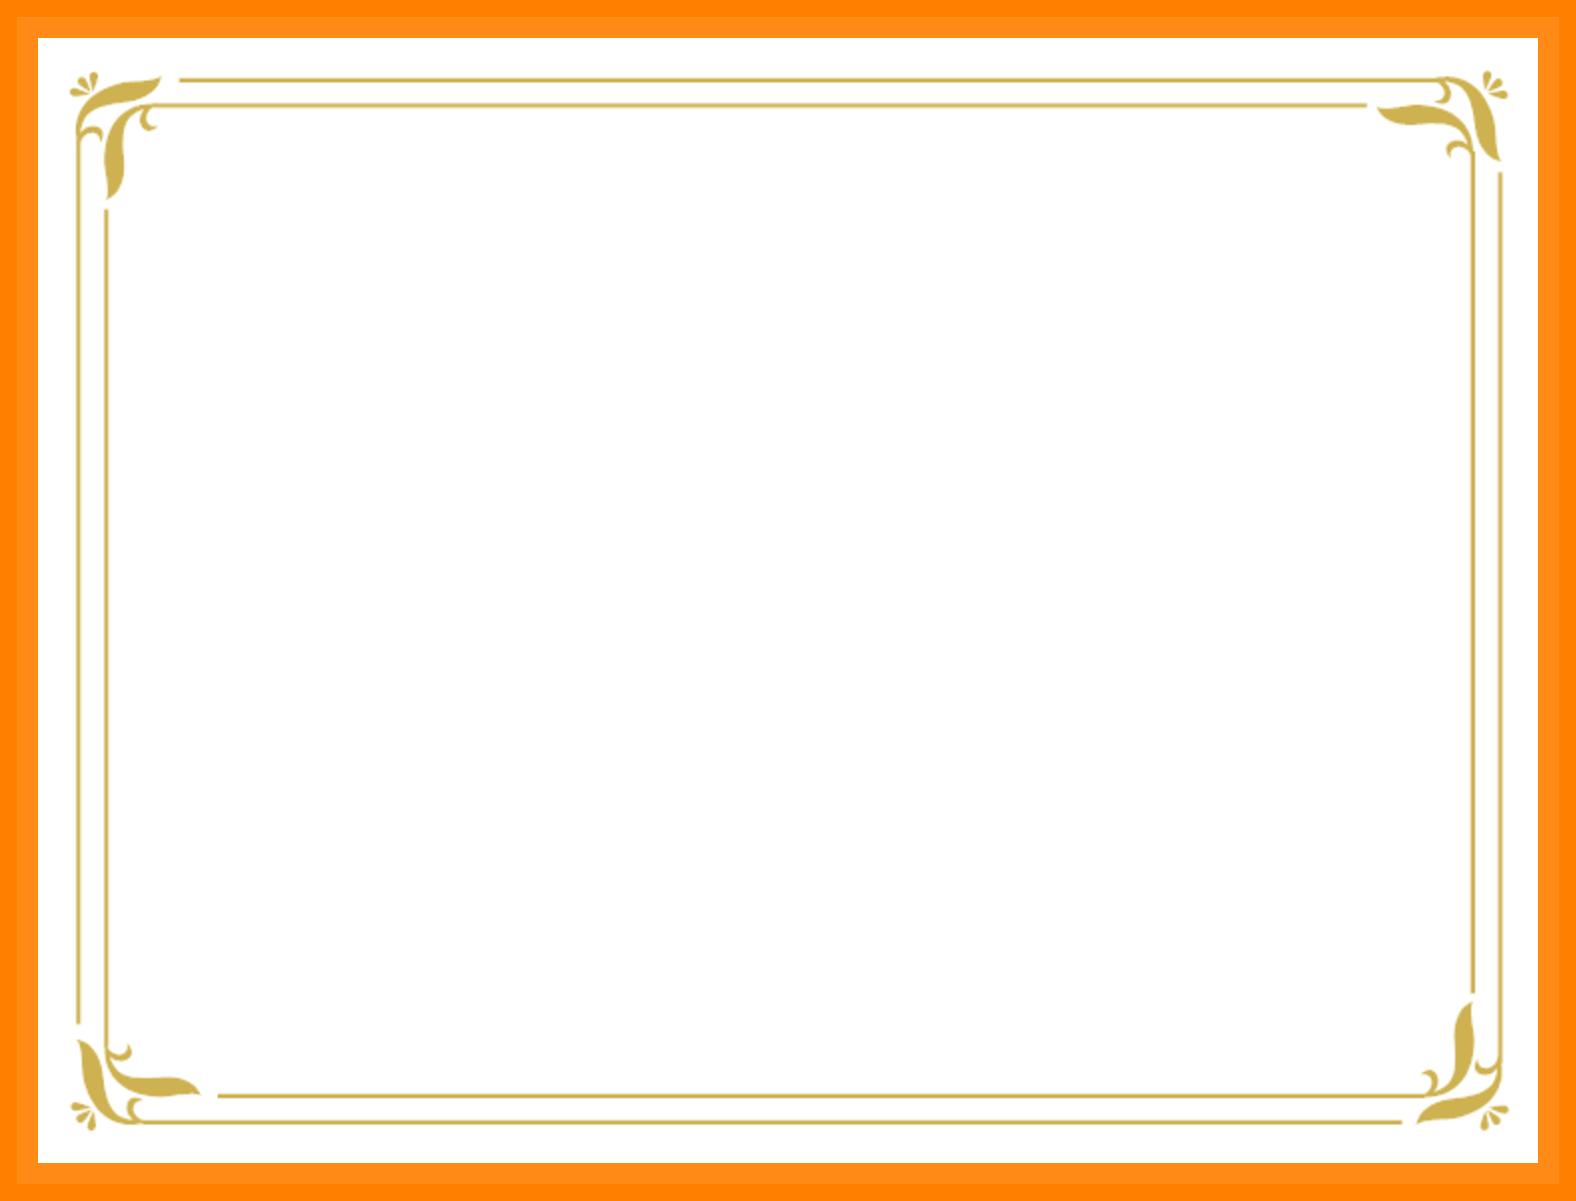 Boder PNG HD - 121246